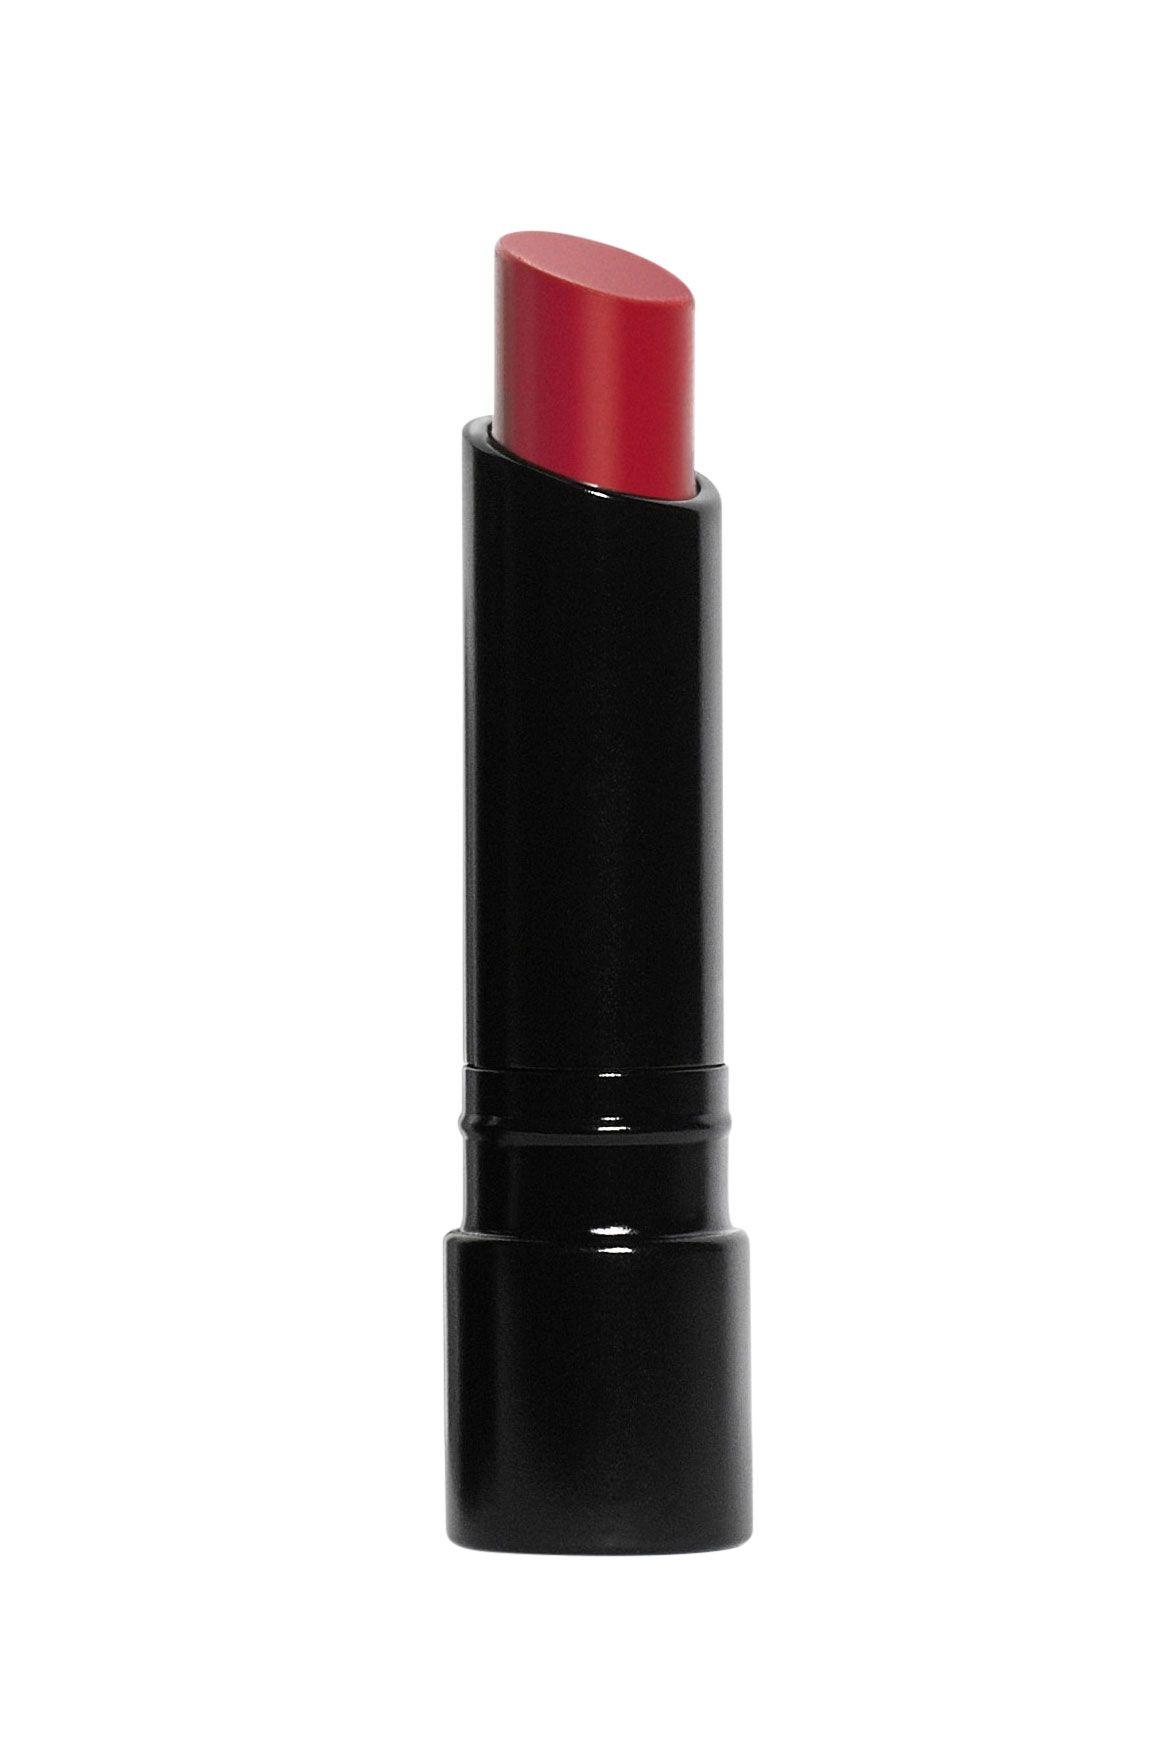 Anti Aging: olay regenerist anti-aging lip treatment ($19)